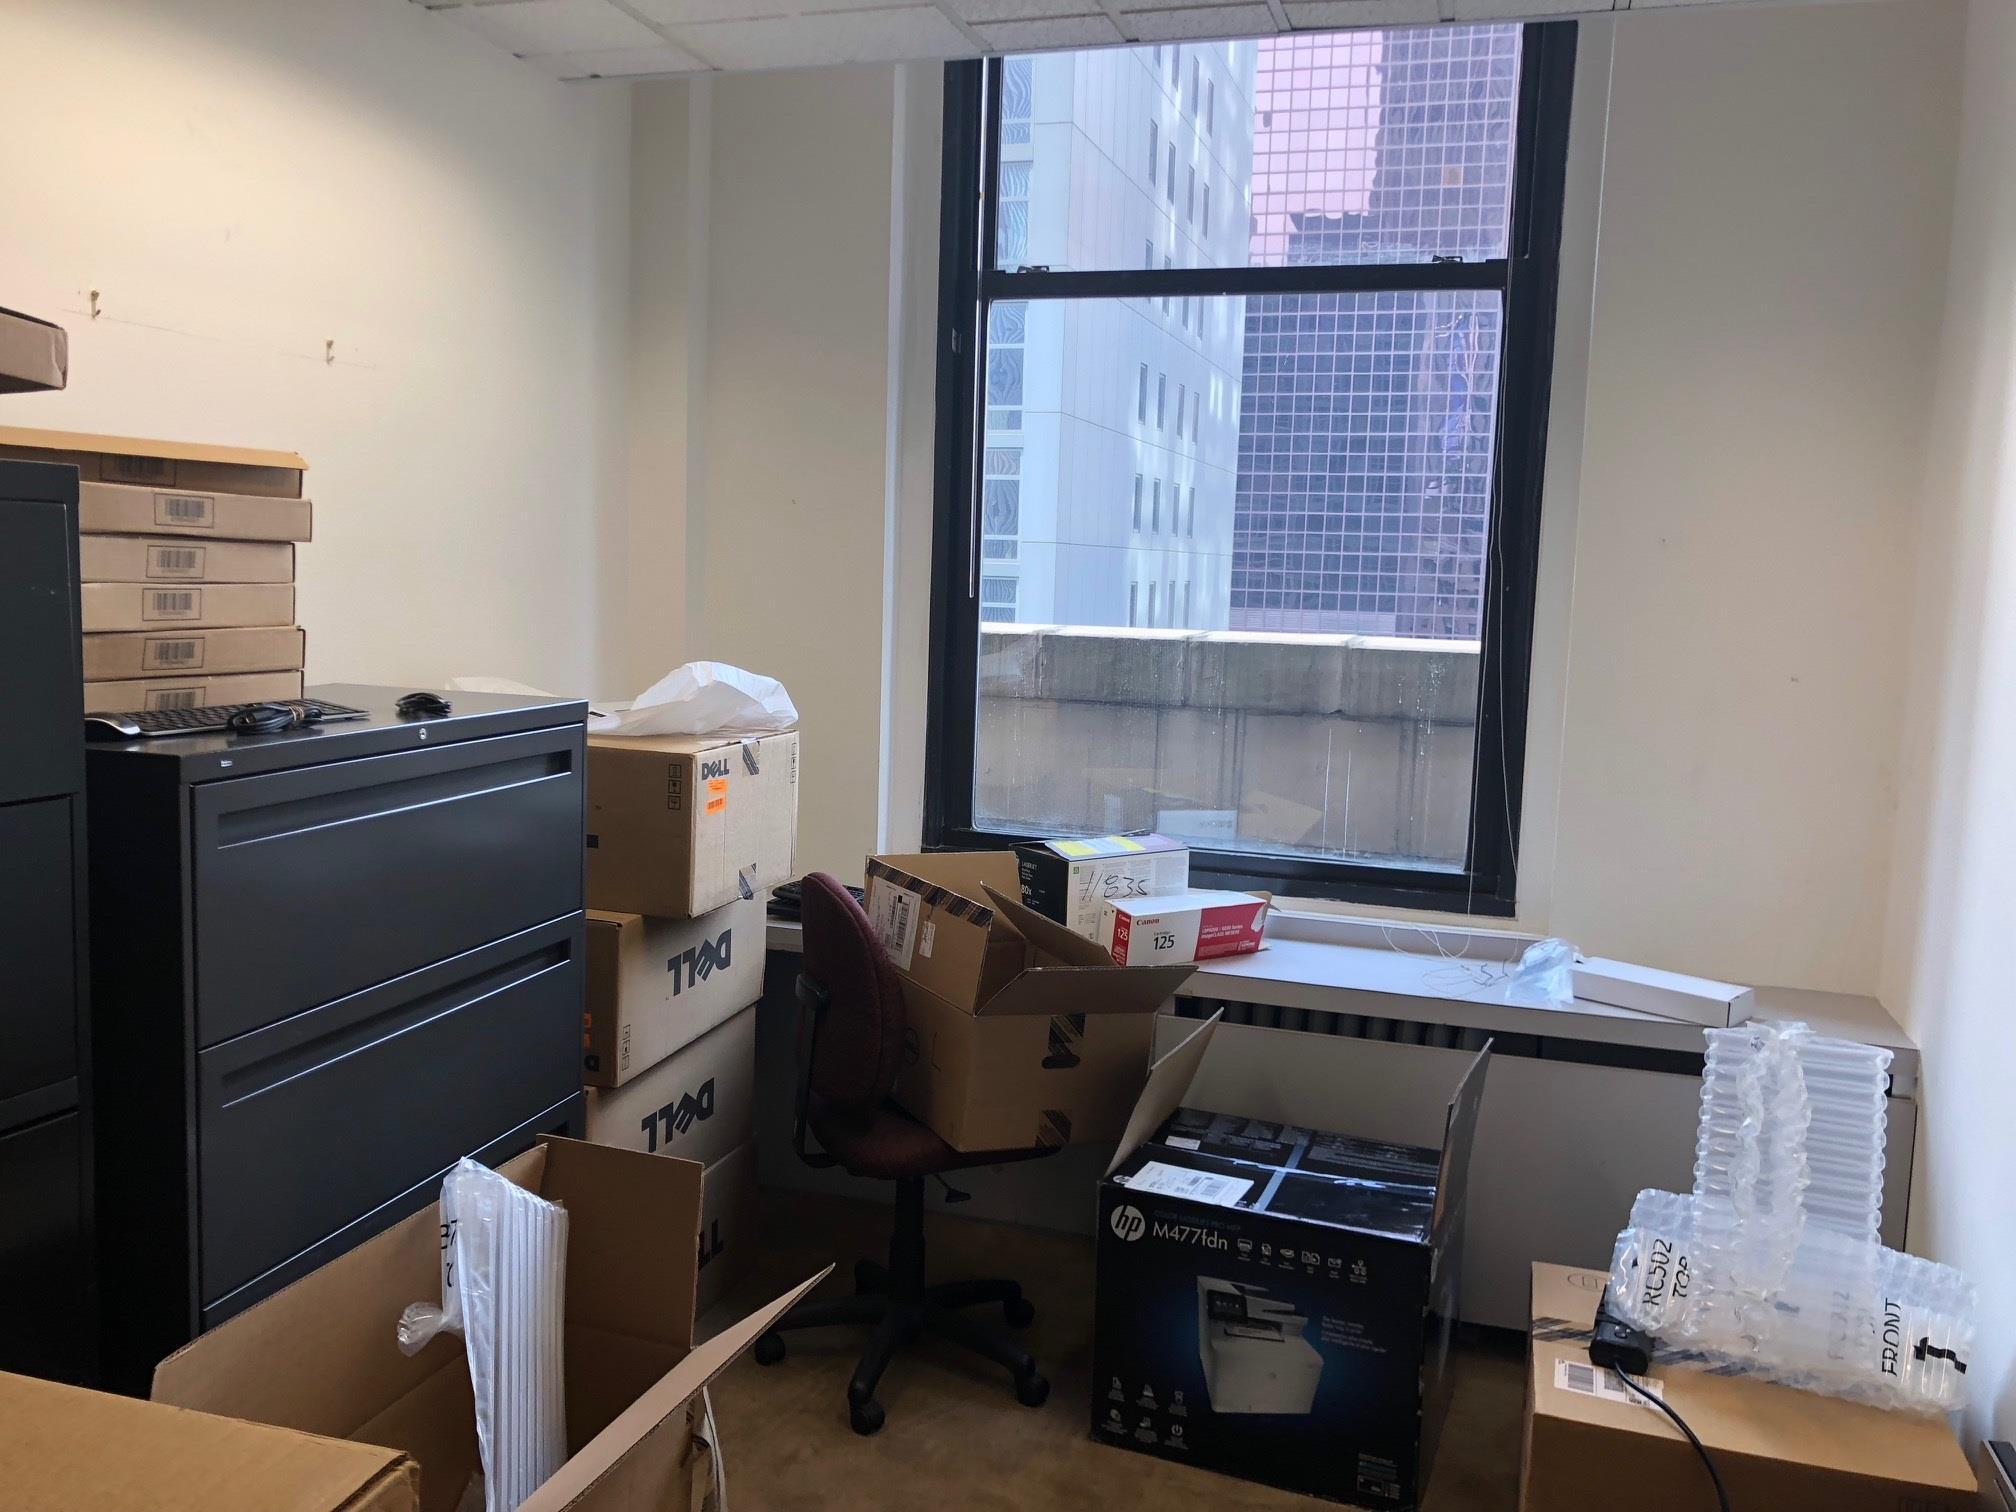 729 Seventh Avenue - Office 6